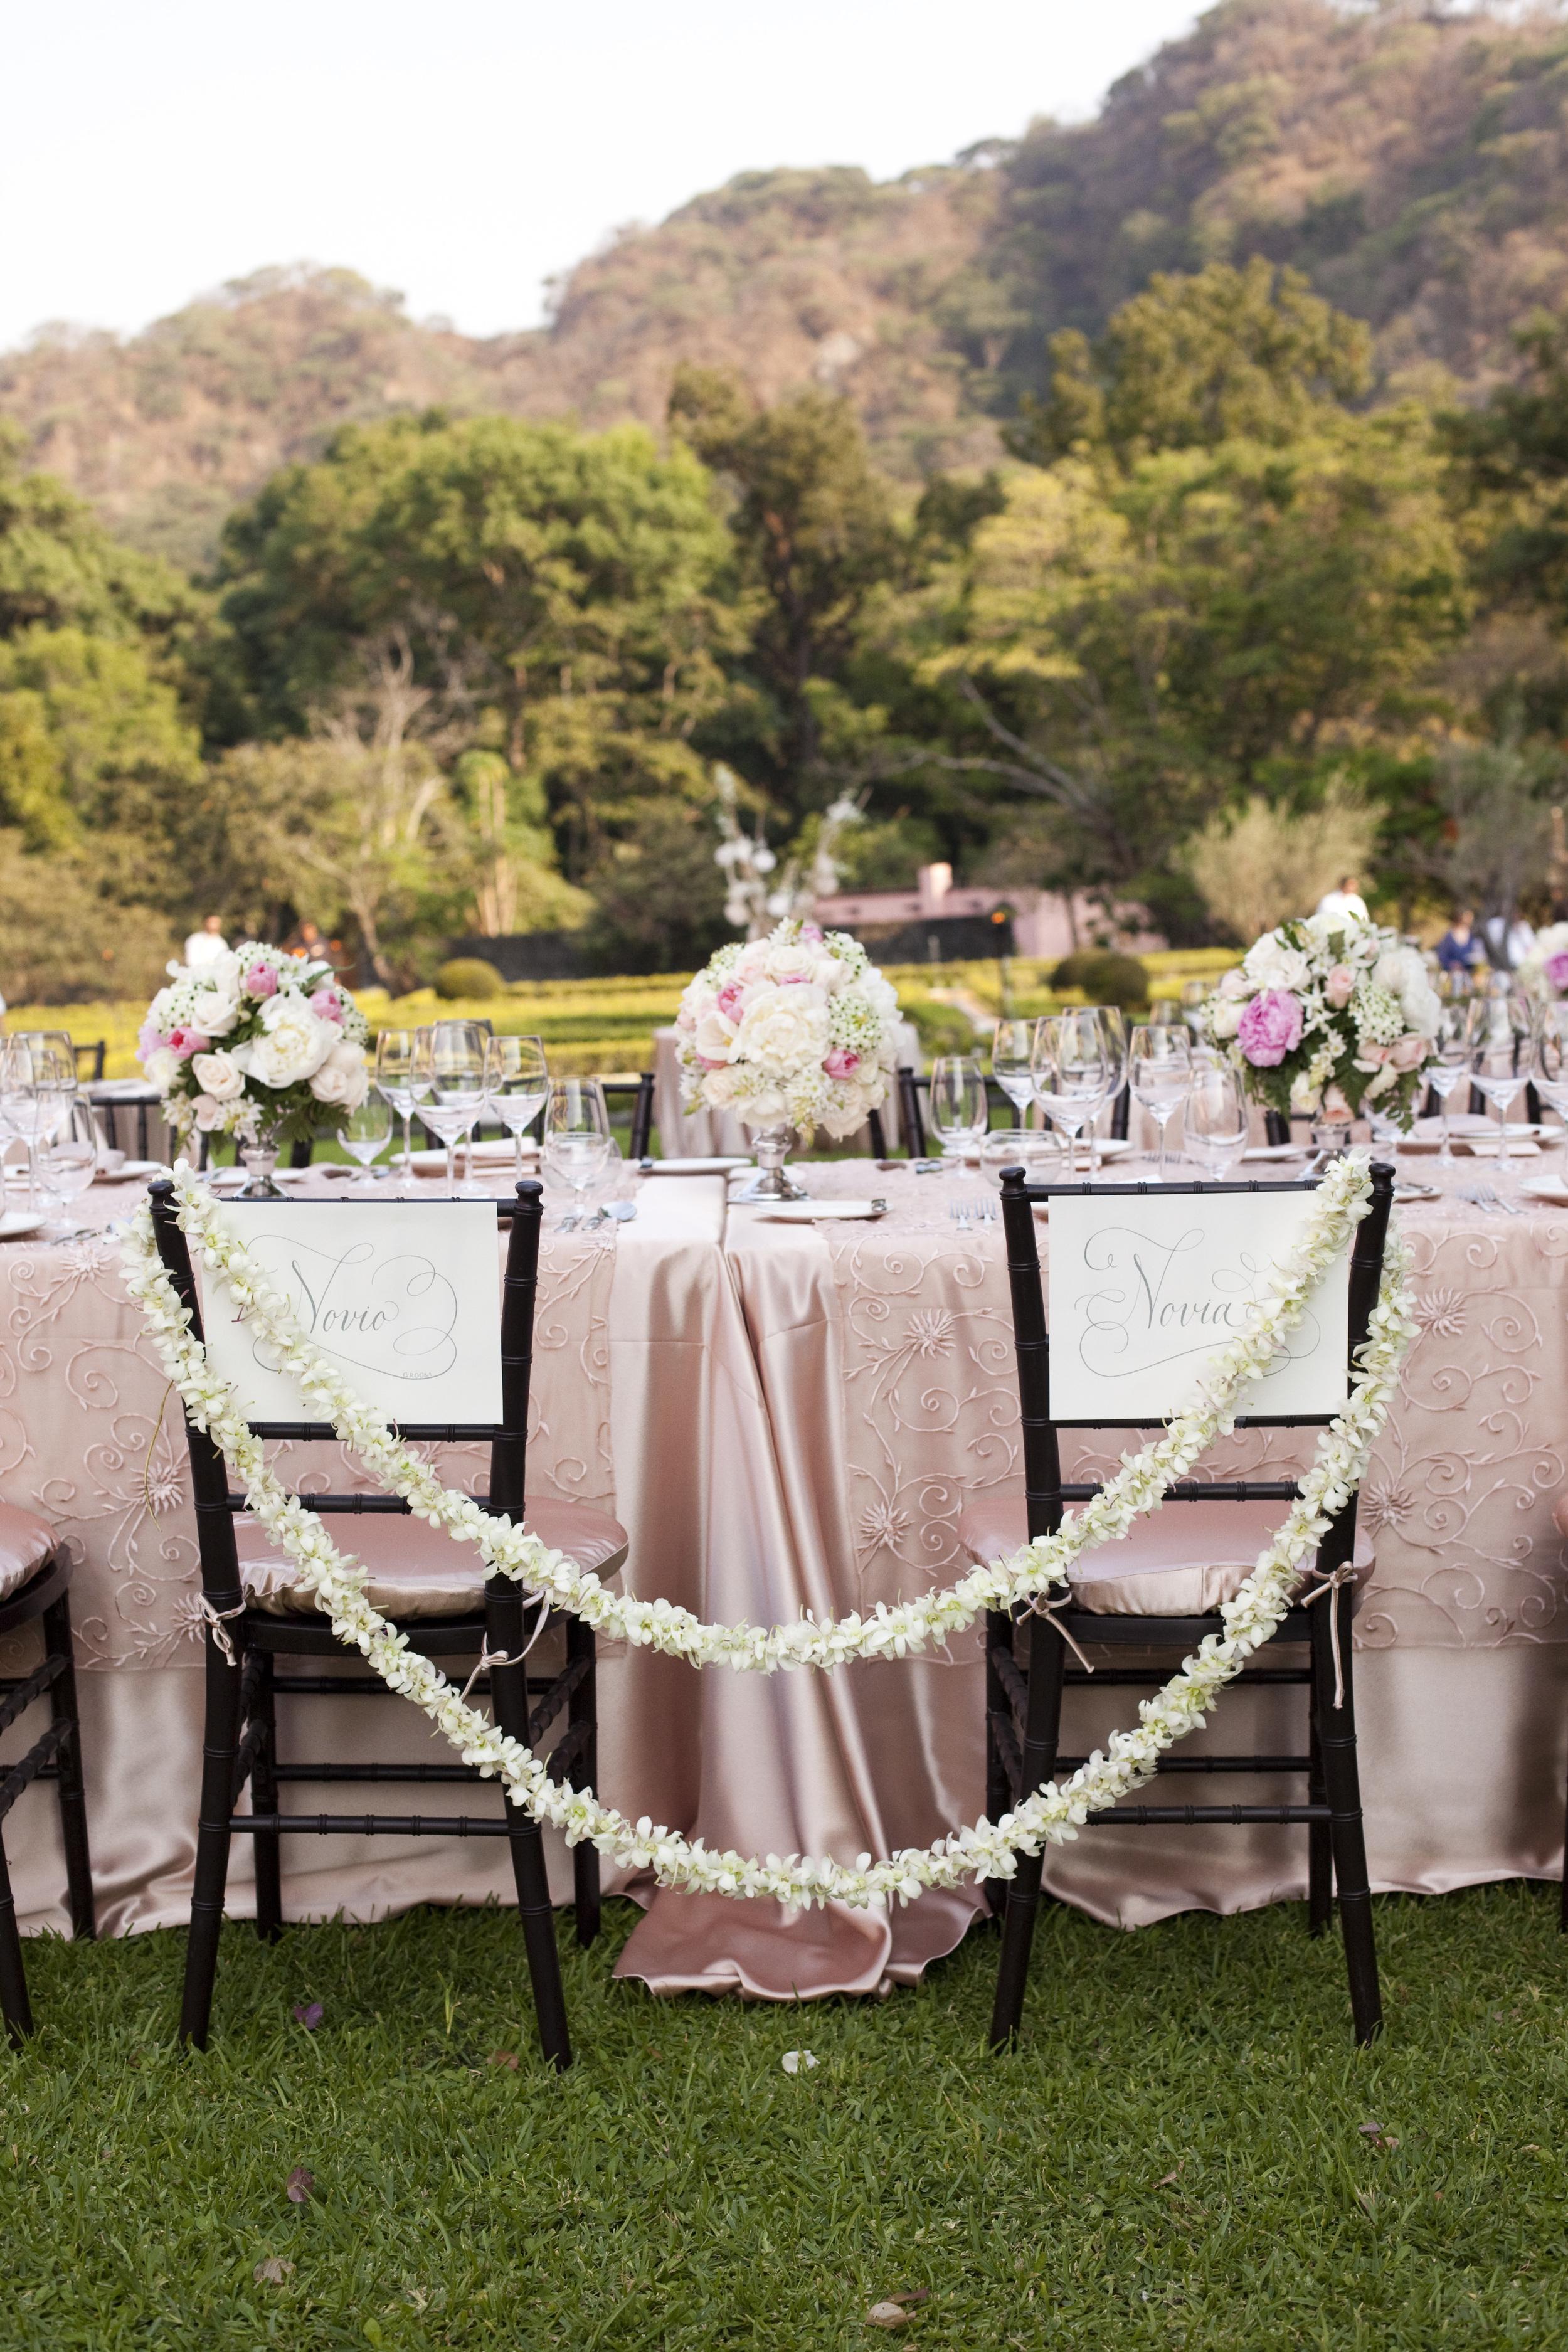 Ceci_New_York_Style_Luxury_Custom_Mexico_Wedding_CeciBride_Letterpress_NewYork_Foil_Hacienda_de_San_Antonio_42.jpg